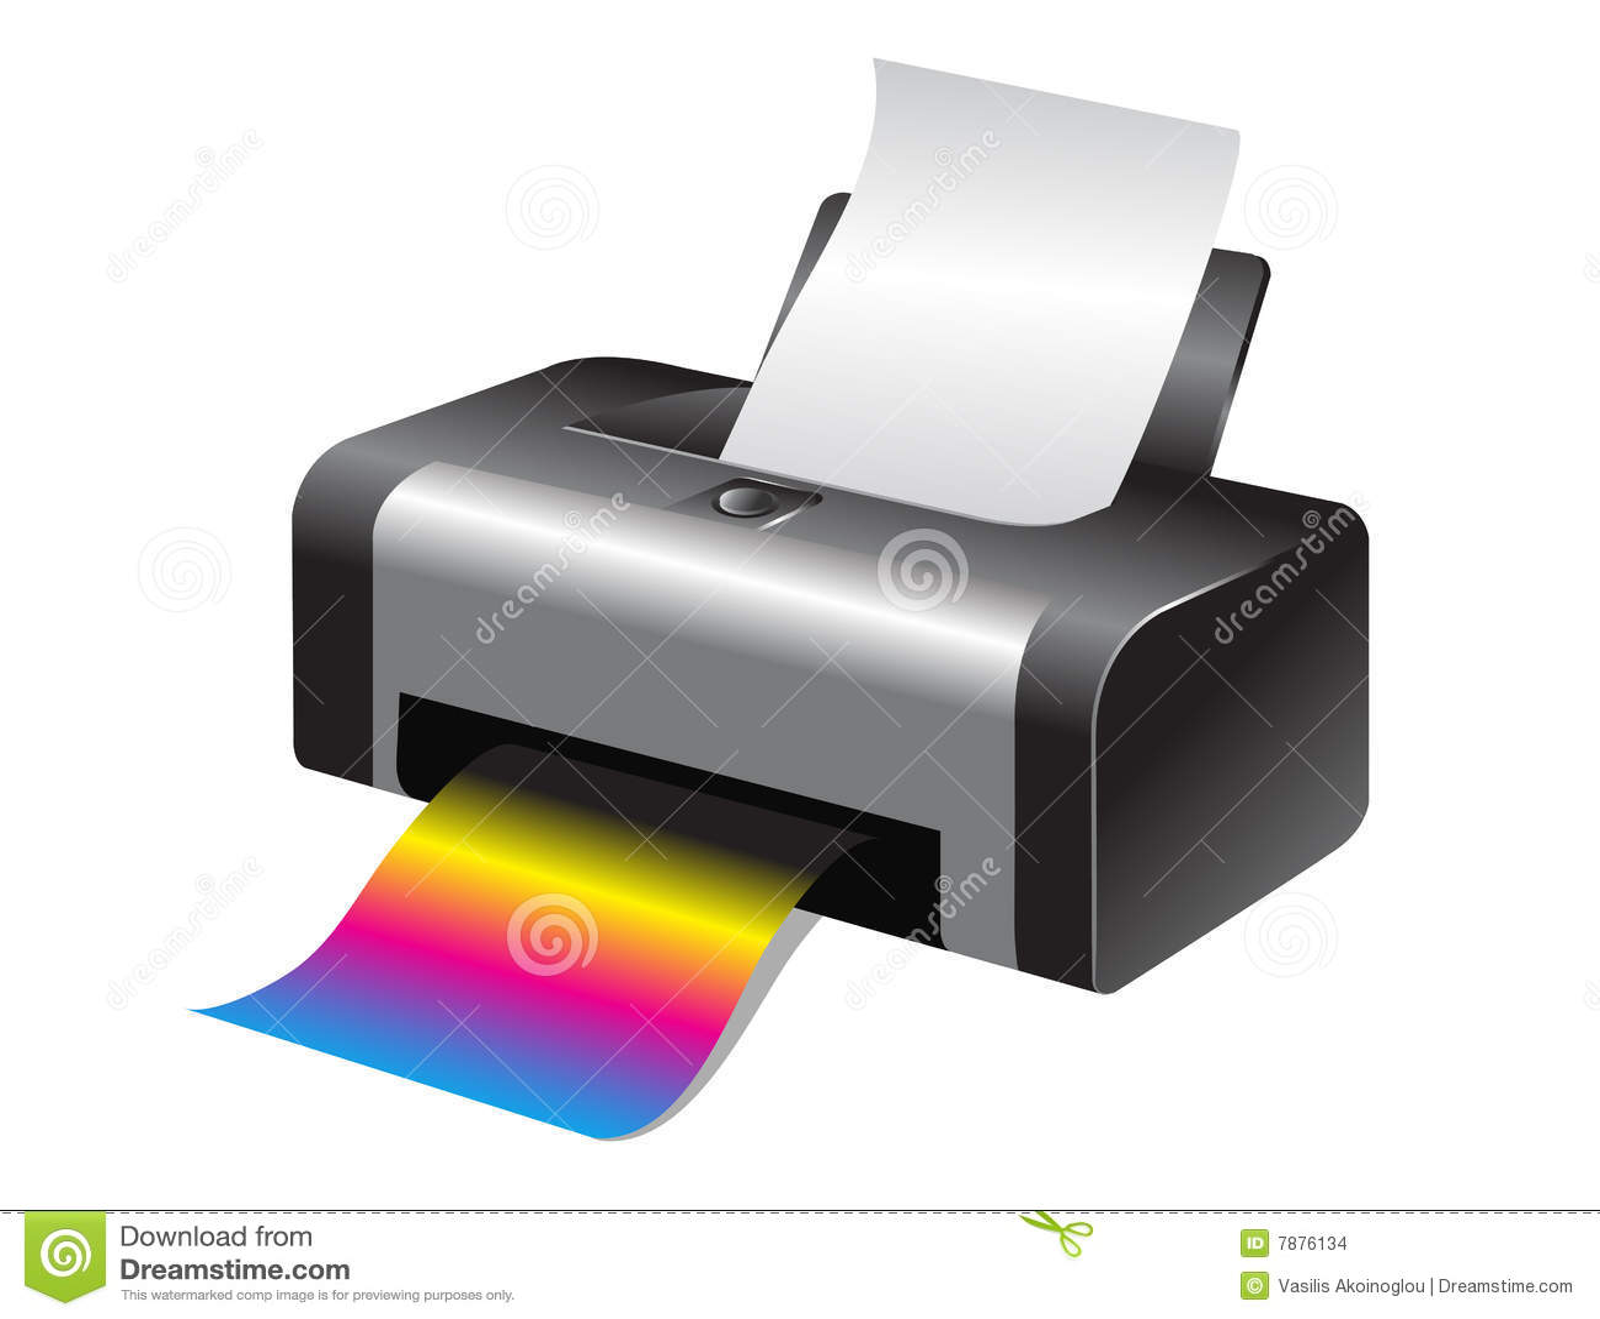 Colorful printer stock vector. Illustration of black ...